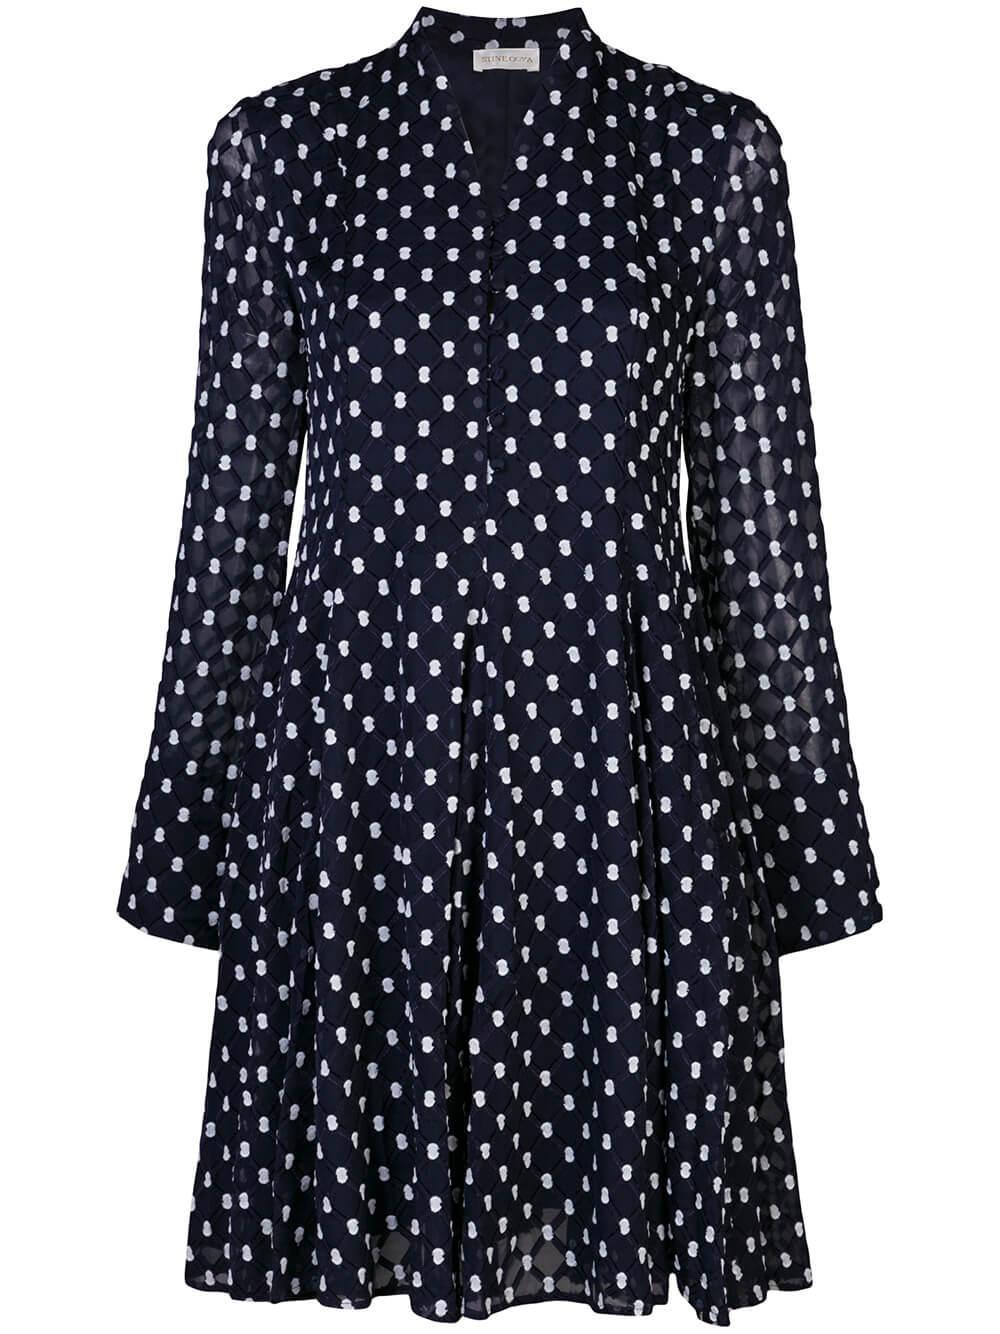 Elisabeth Fil Coupe Shirt Dress